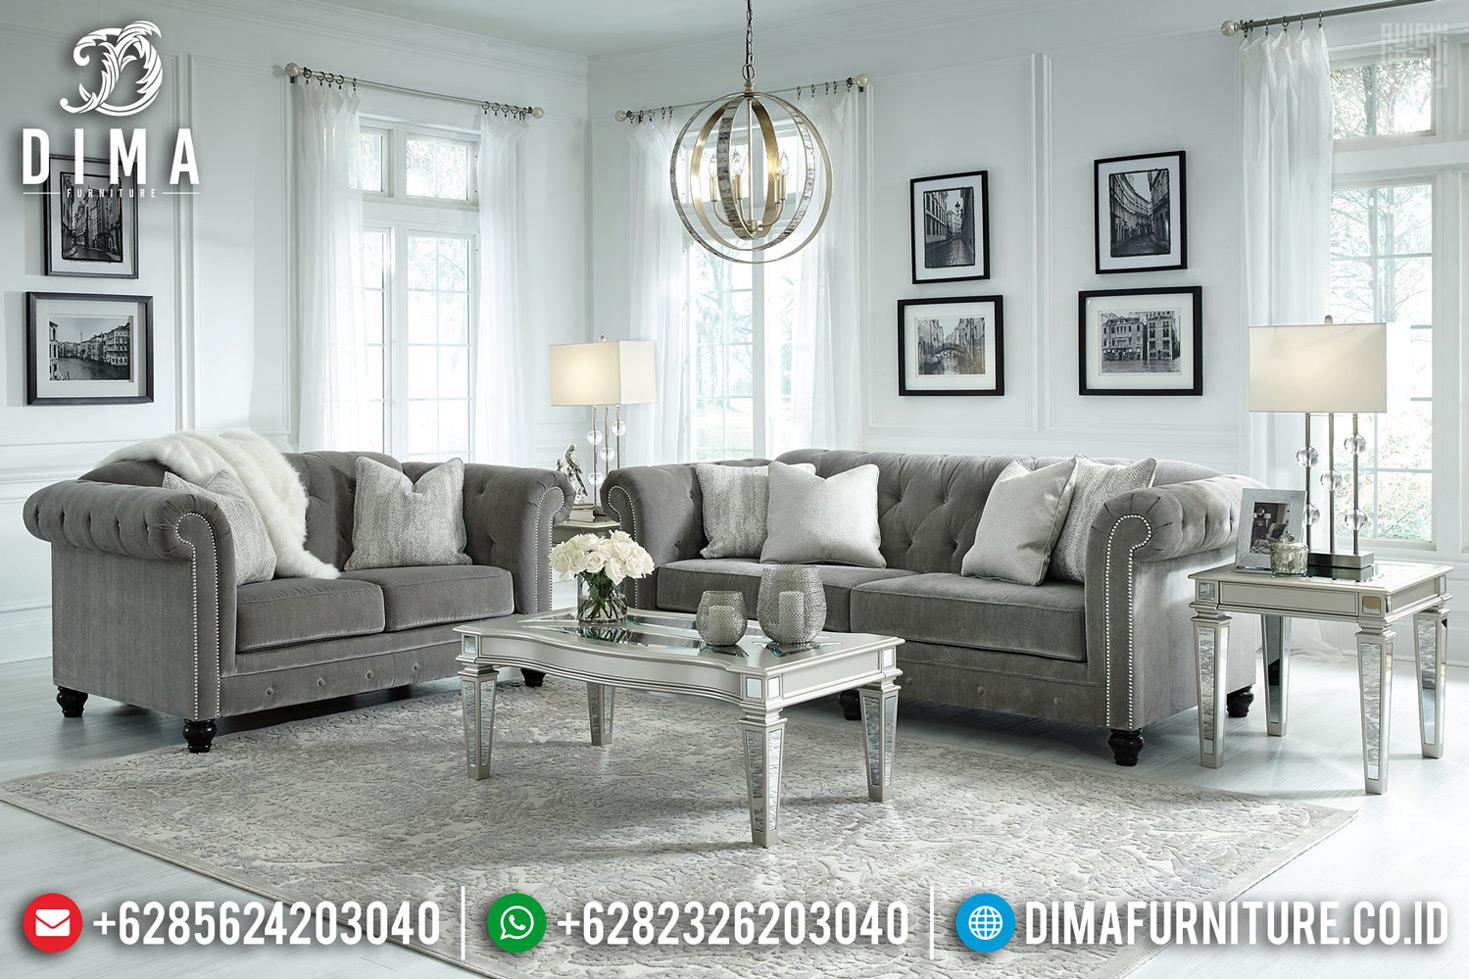 Best Seller Sofa Tamu Mewah Desain Modern New Luxury Interior Style TTJ-0703